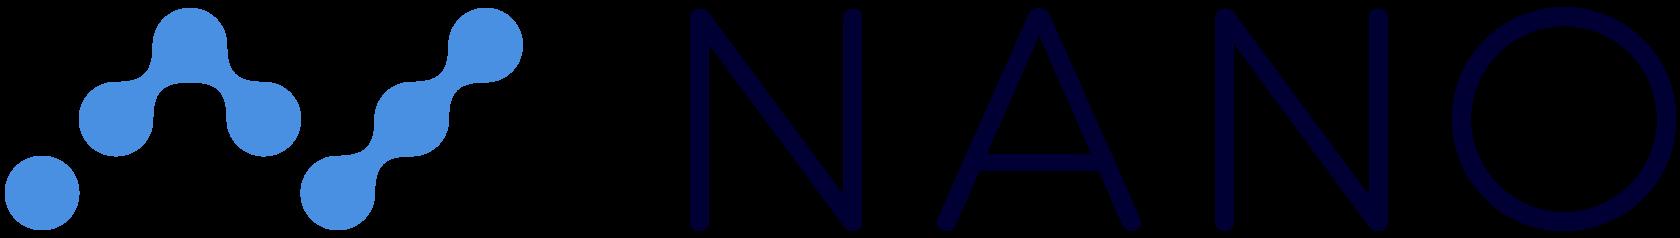 google logo colors